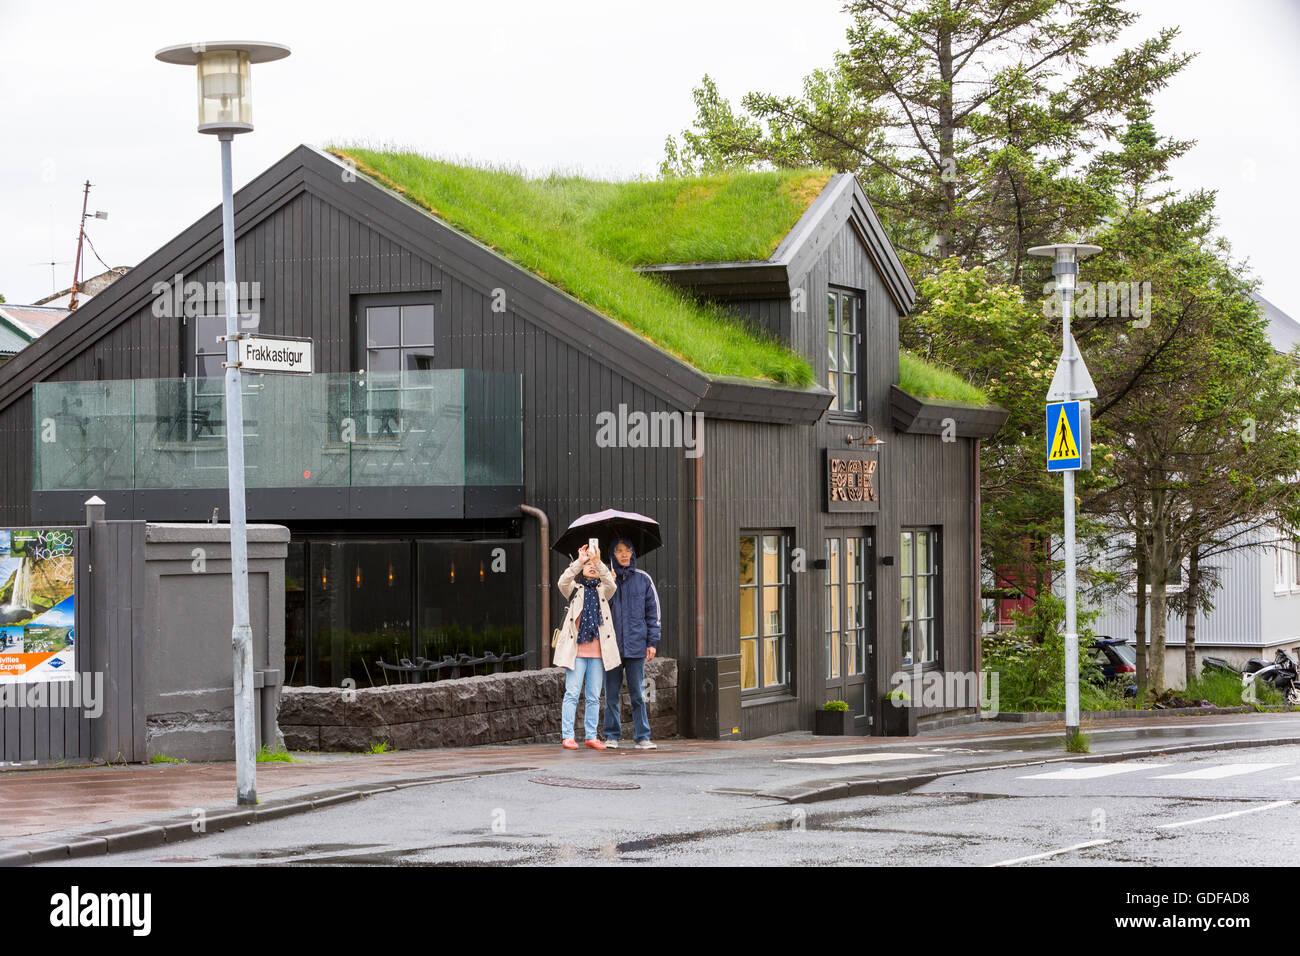 building with sod roof, Frakkastigur Street, Reykjavik, Iceland - Stock Image